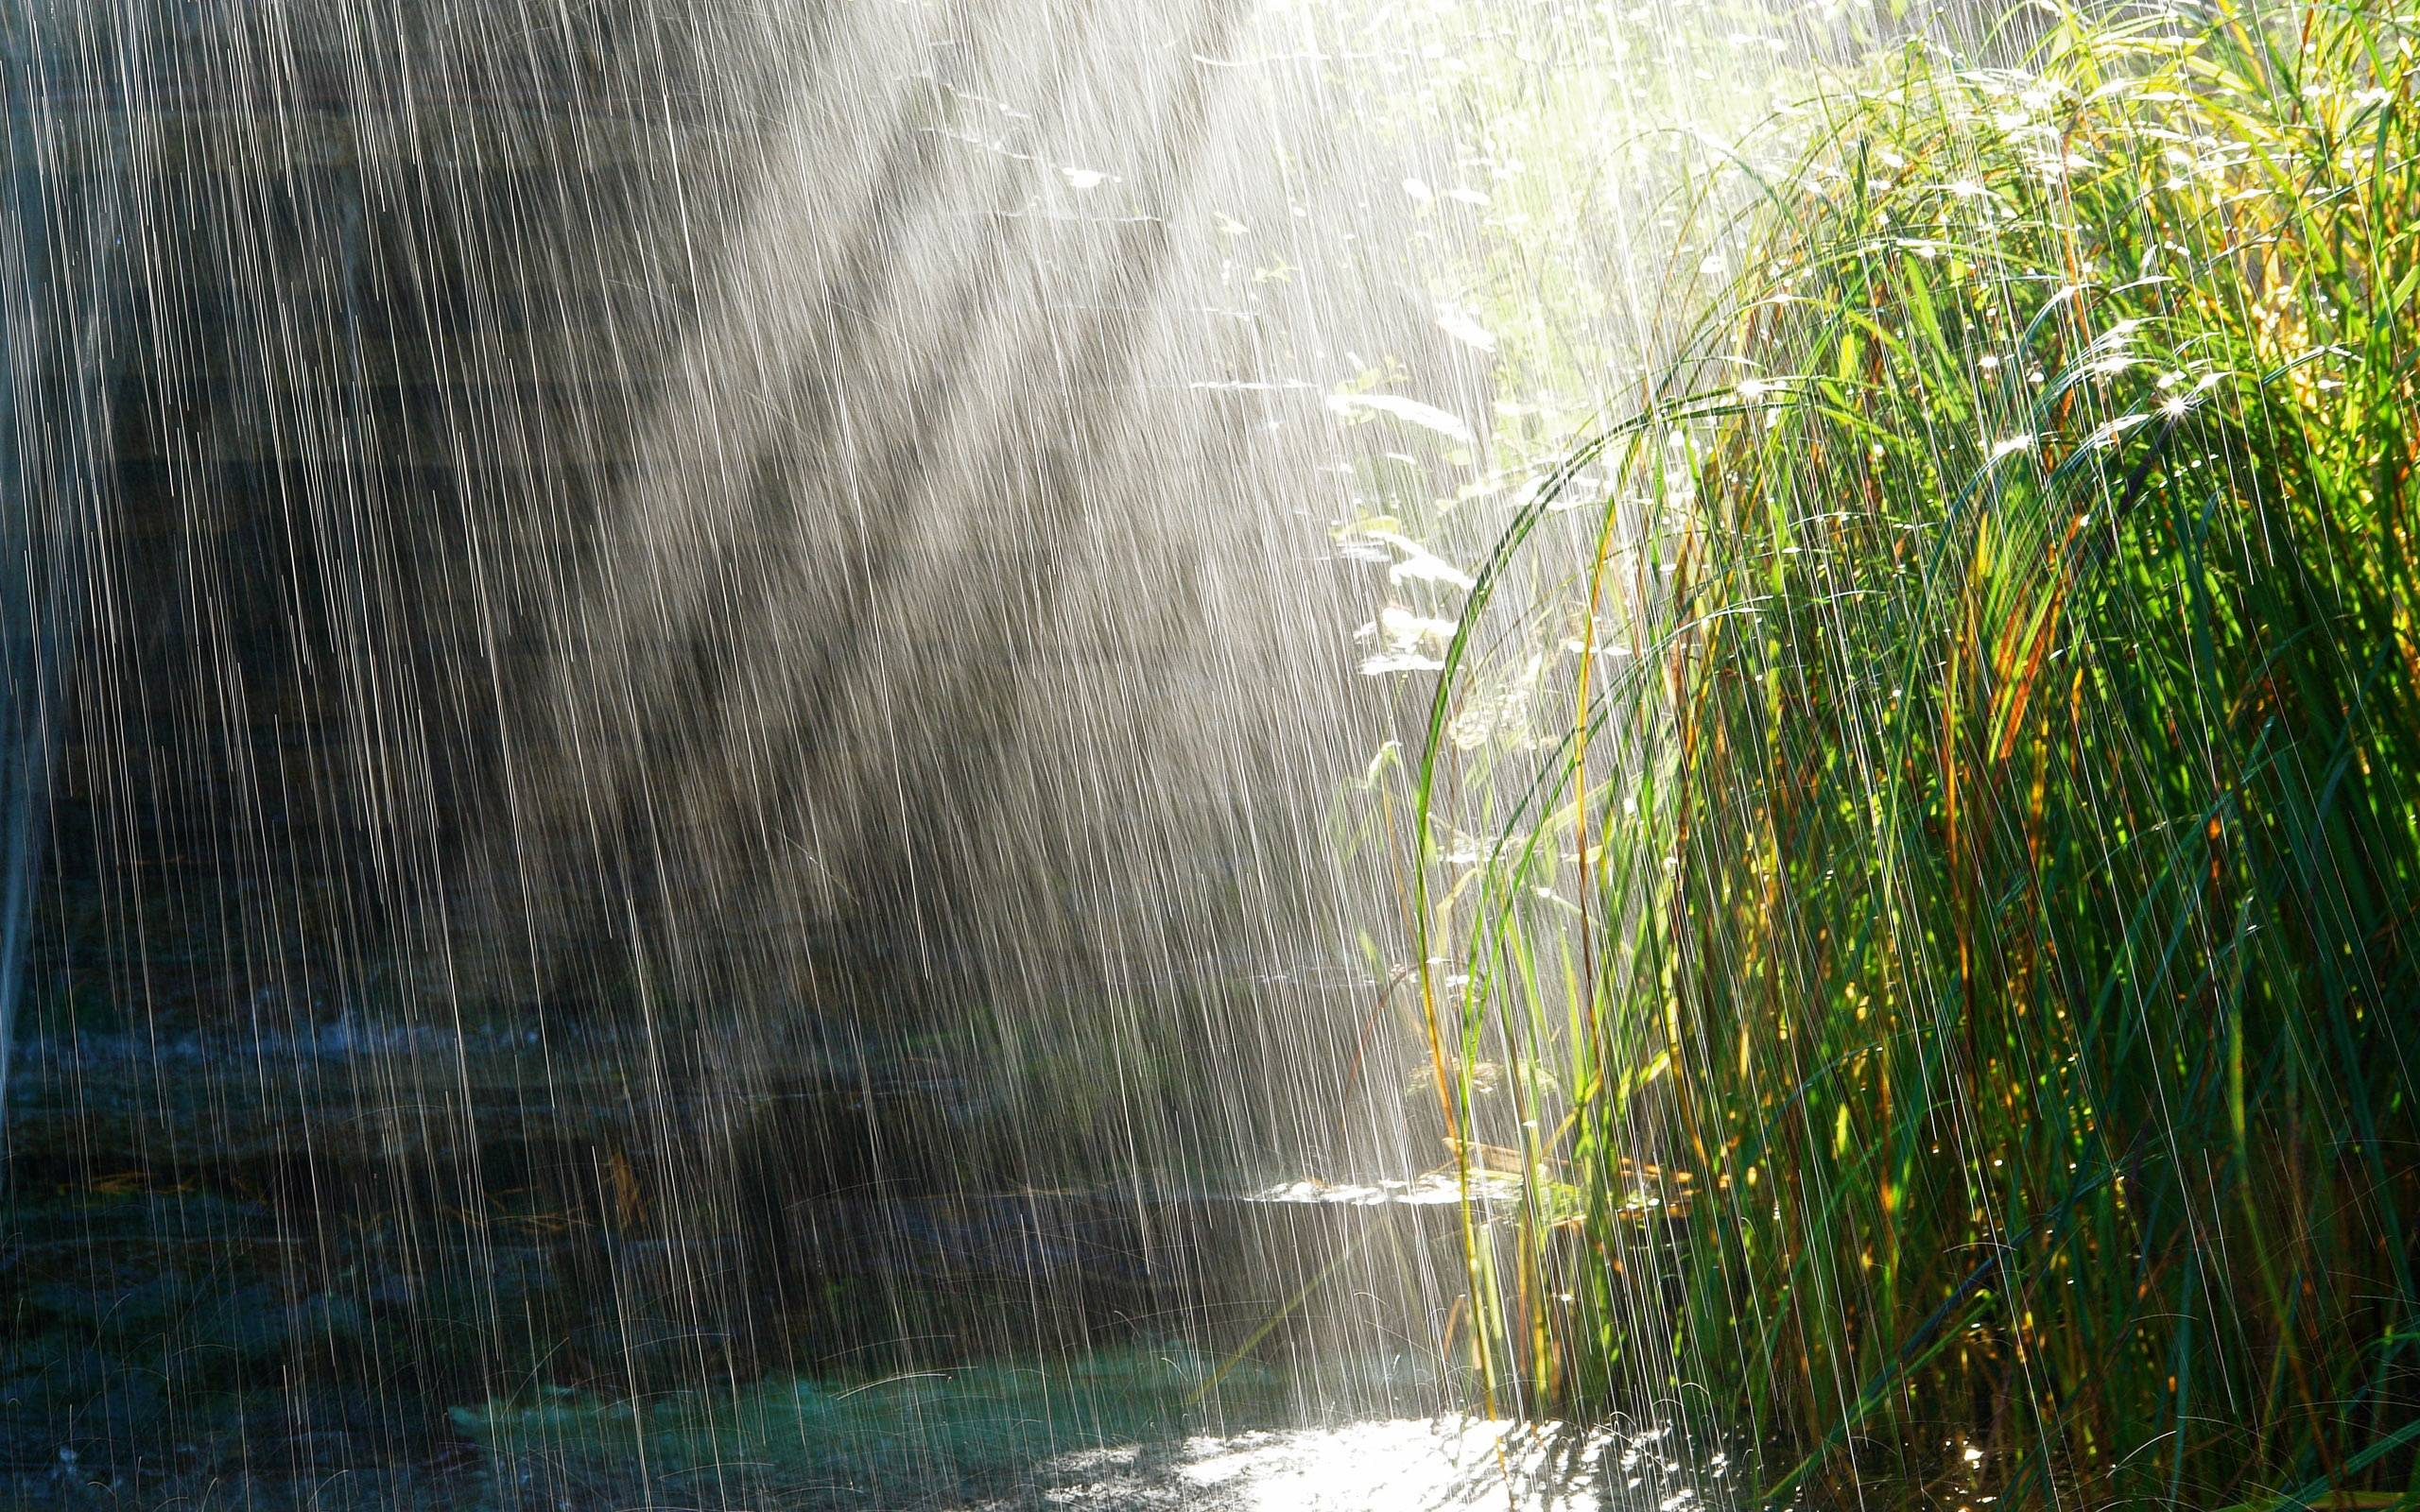 Rainy Day Backgrounds 2560x1600